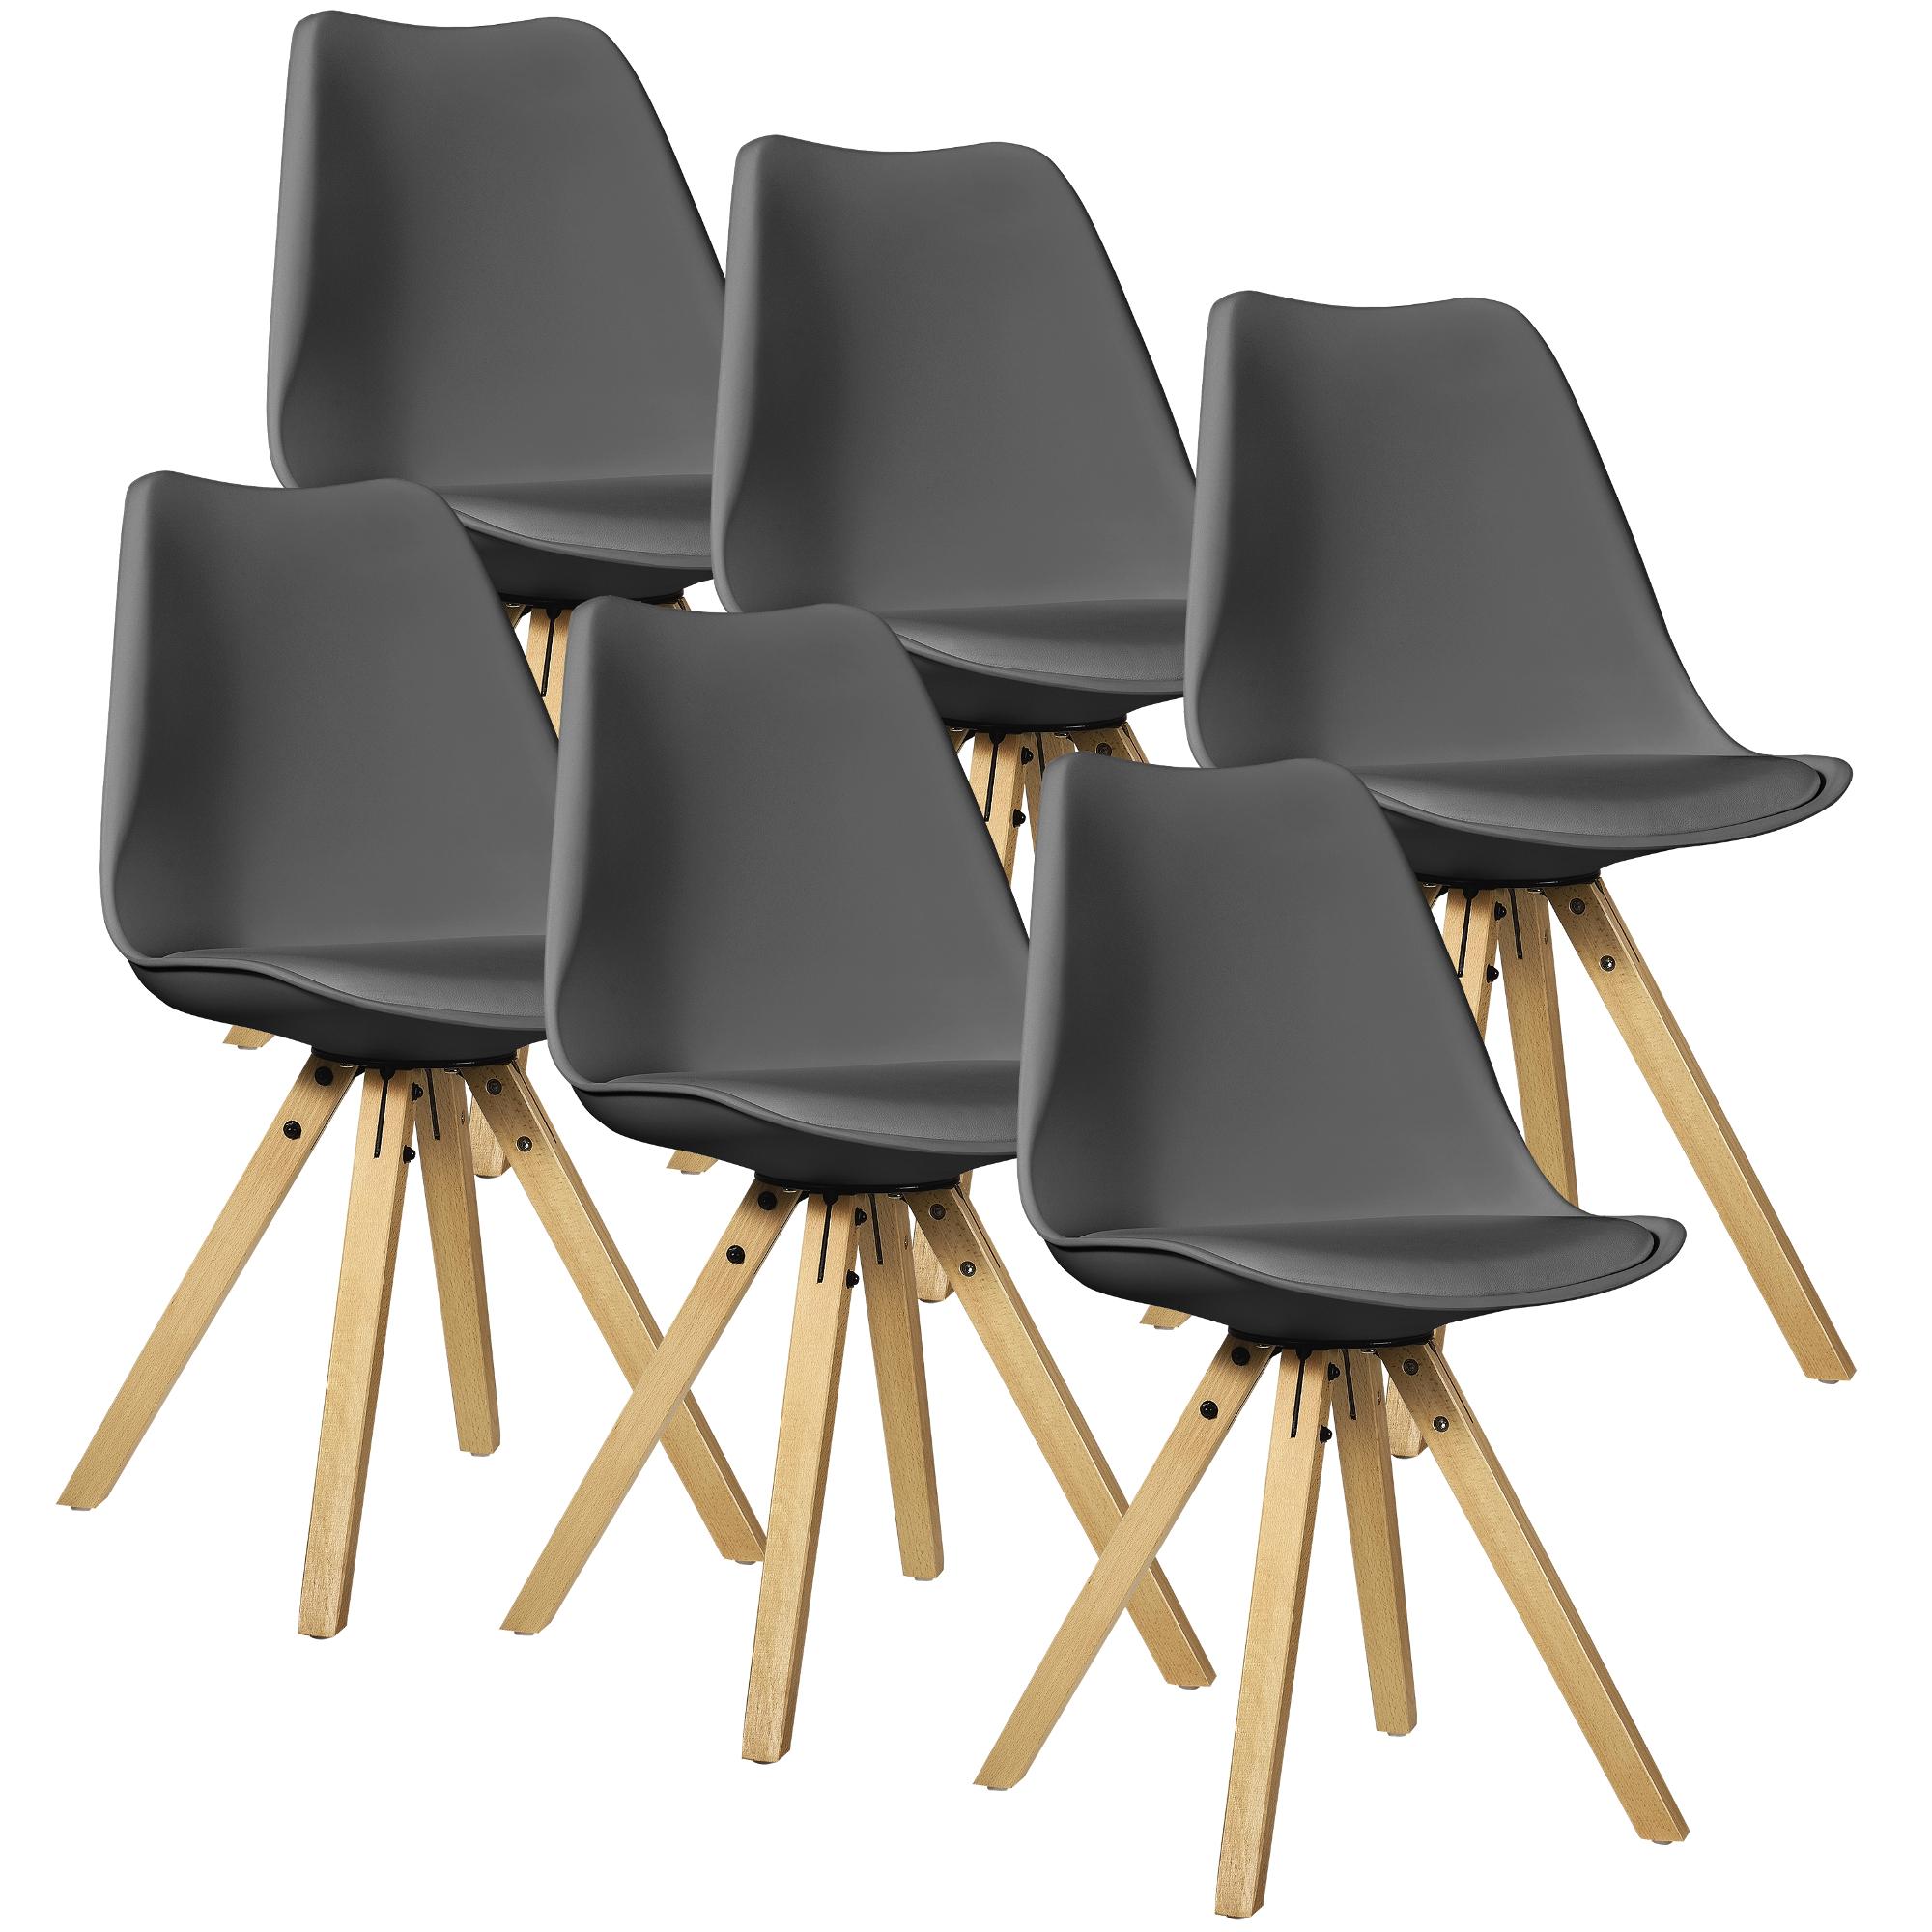 en.casa] 6x Design Stühle Esszimmer Grau Stuhl Holz Plastik Kunst ...